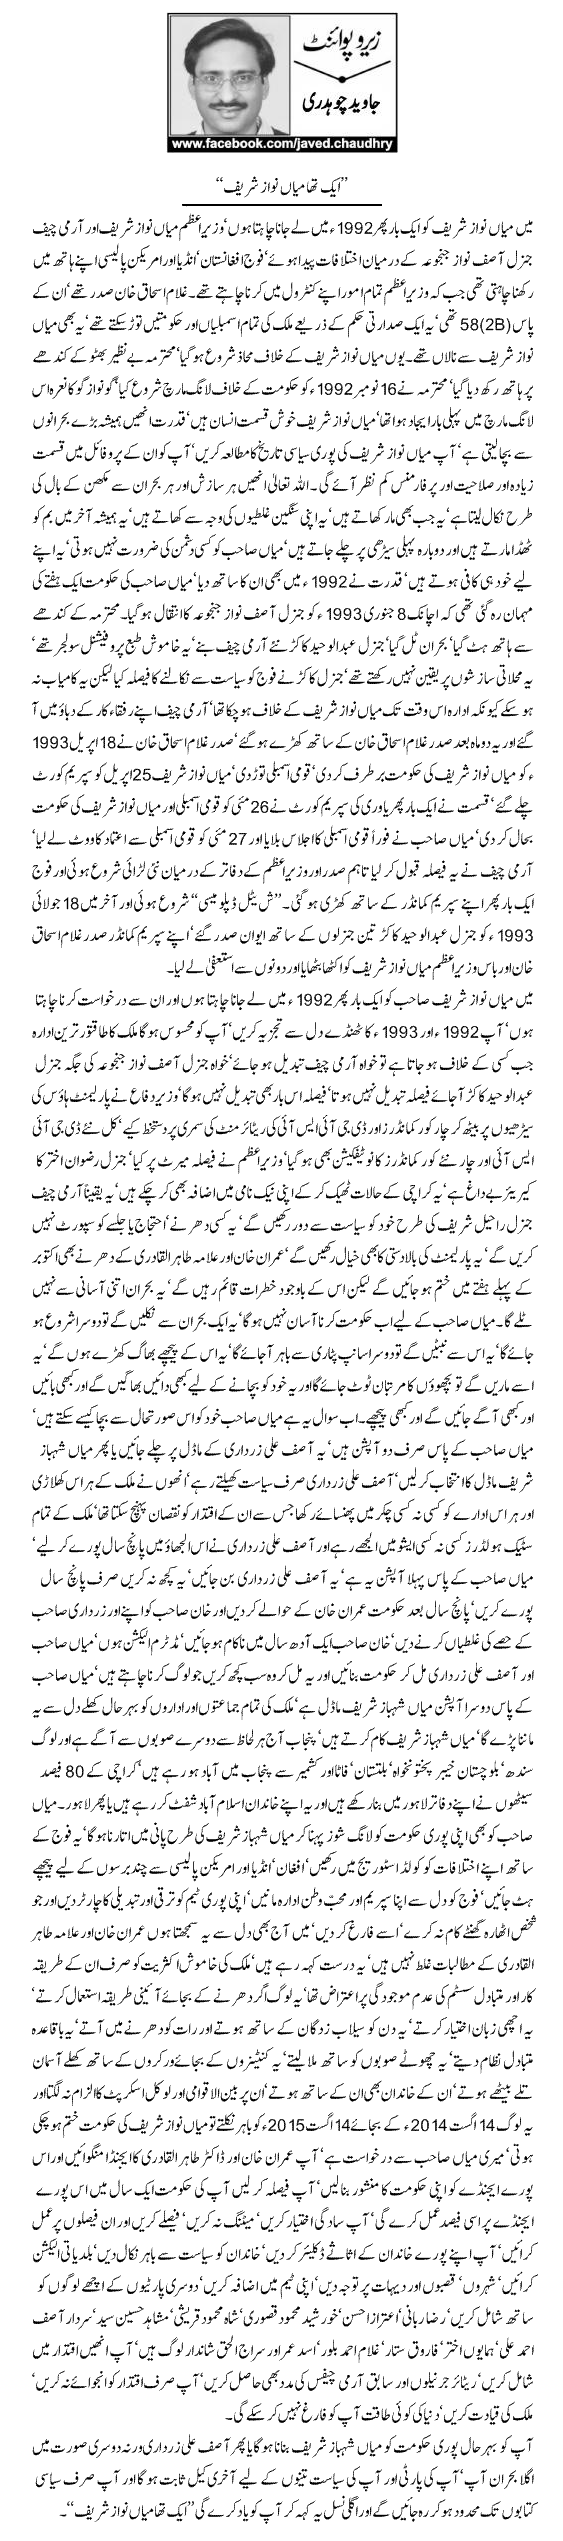 Aik tha Mian Nawaz Sharif by Javed Chaudhry